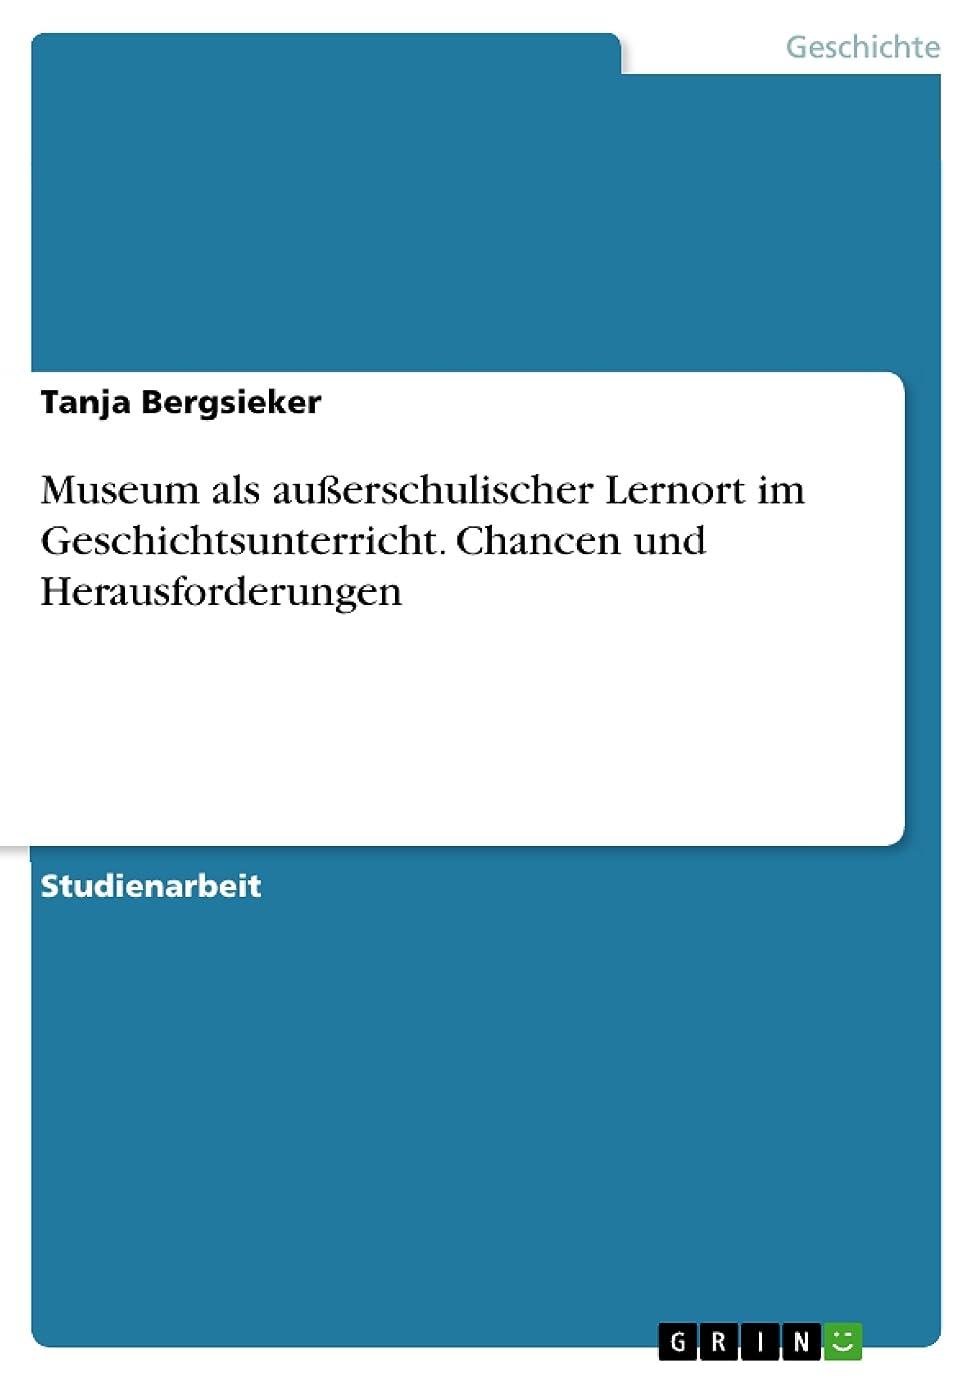 団結する櫛留め金Museum als au?erschulischer Lernort im Geschichtsunterricht. Chancen und Herausforderungen (German Edition)